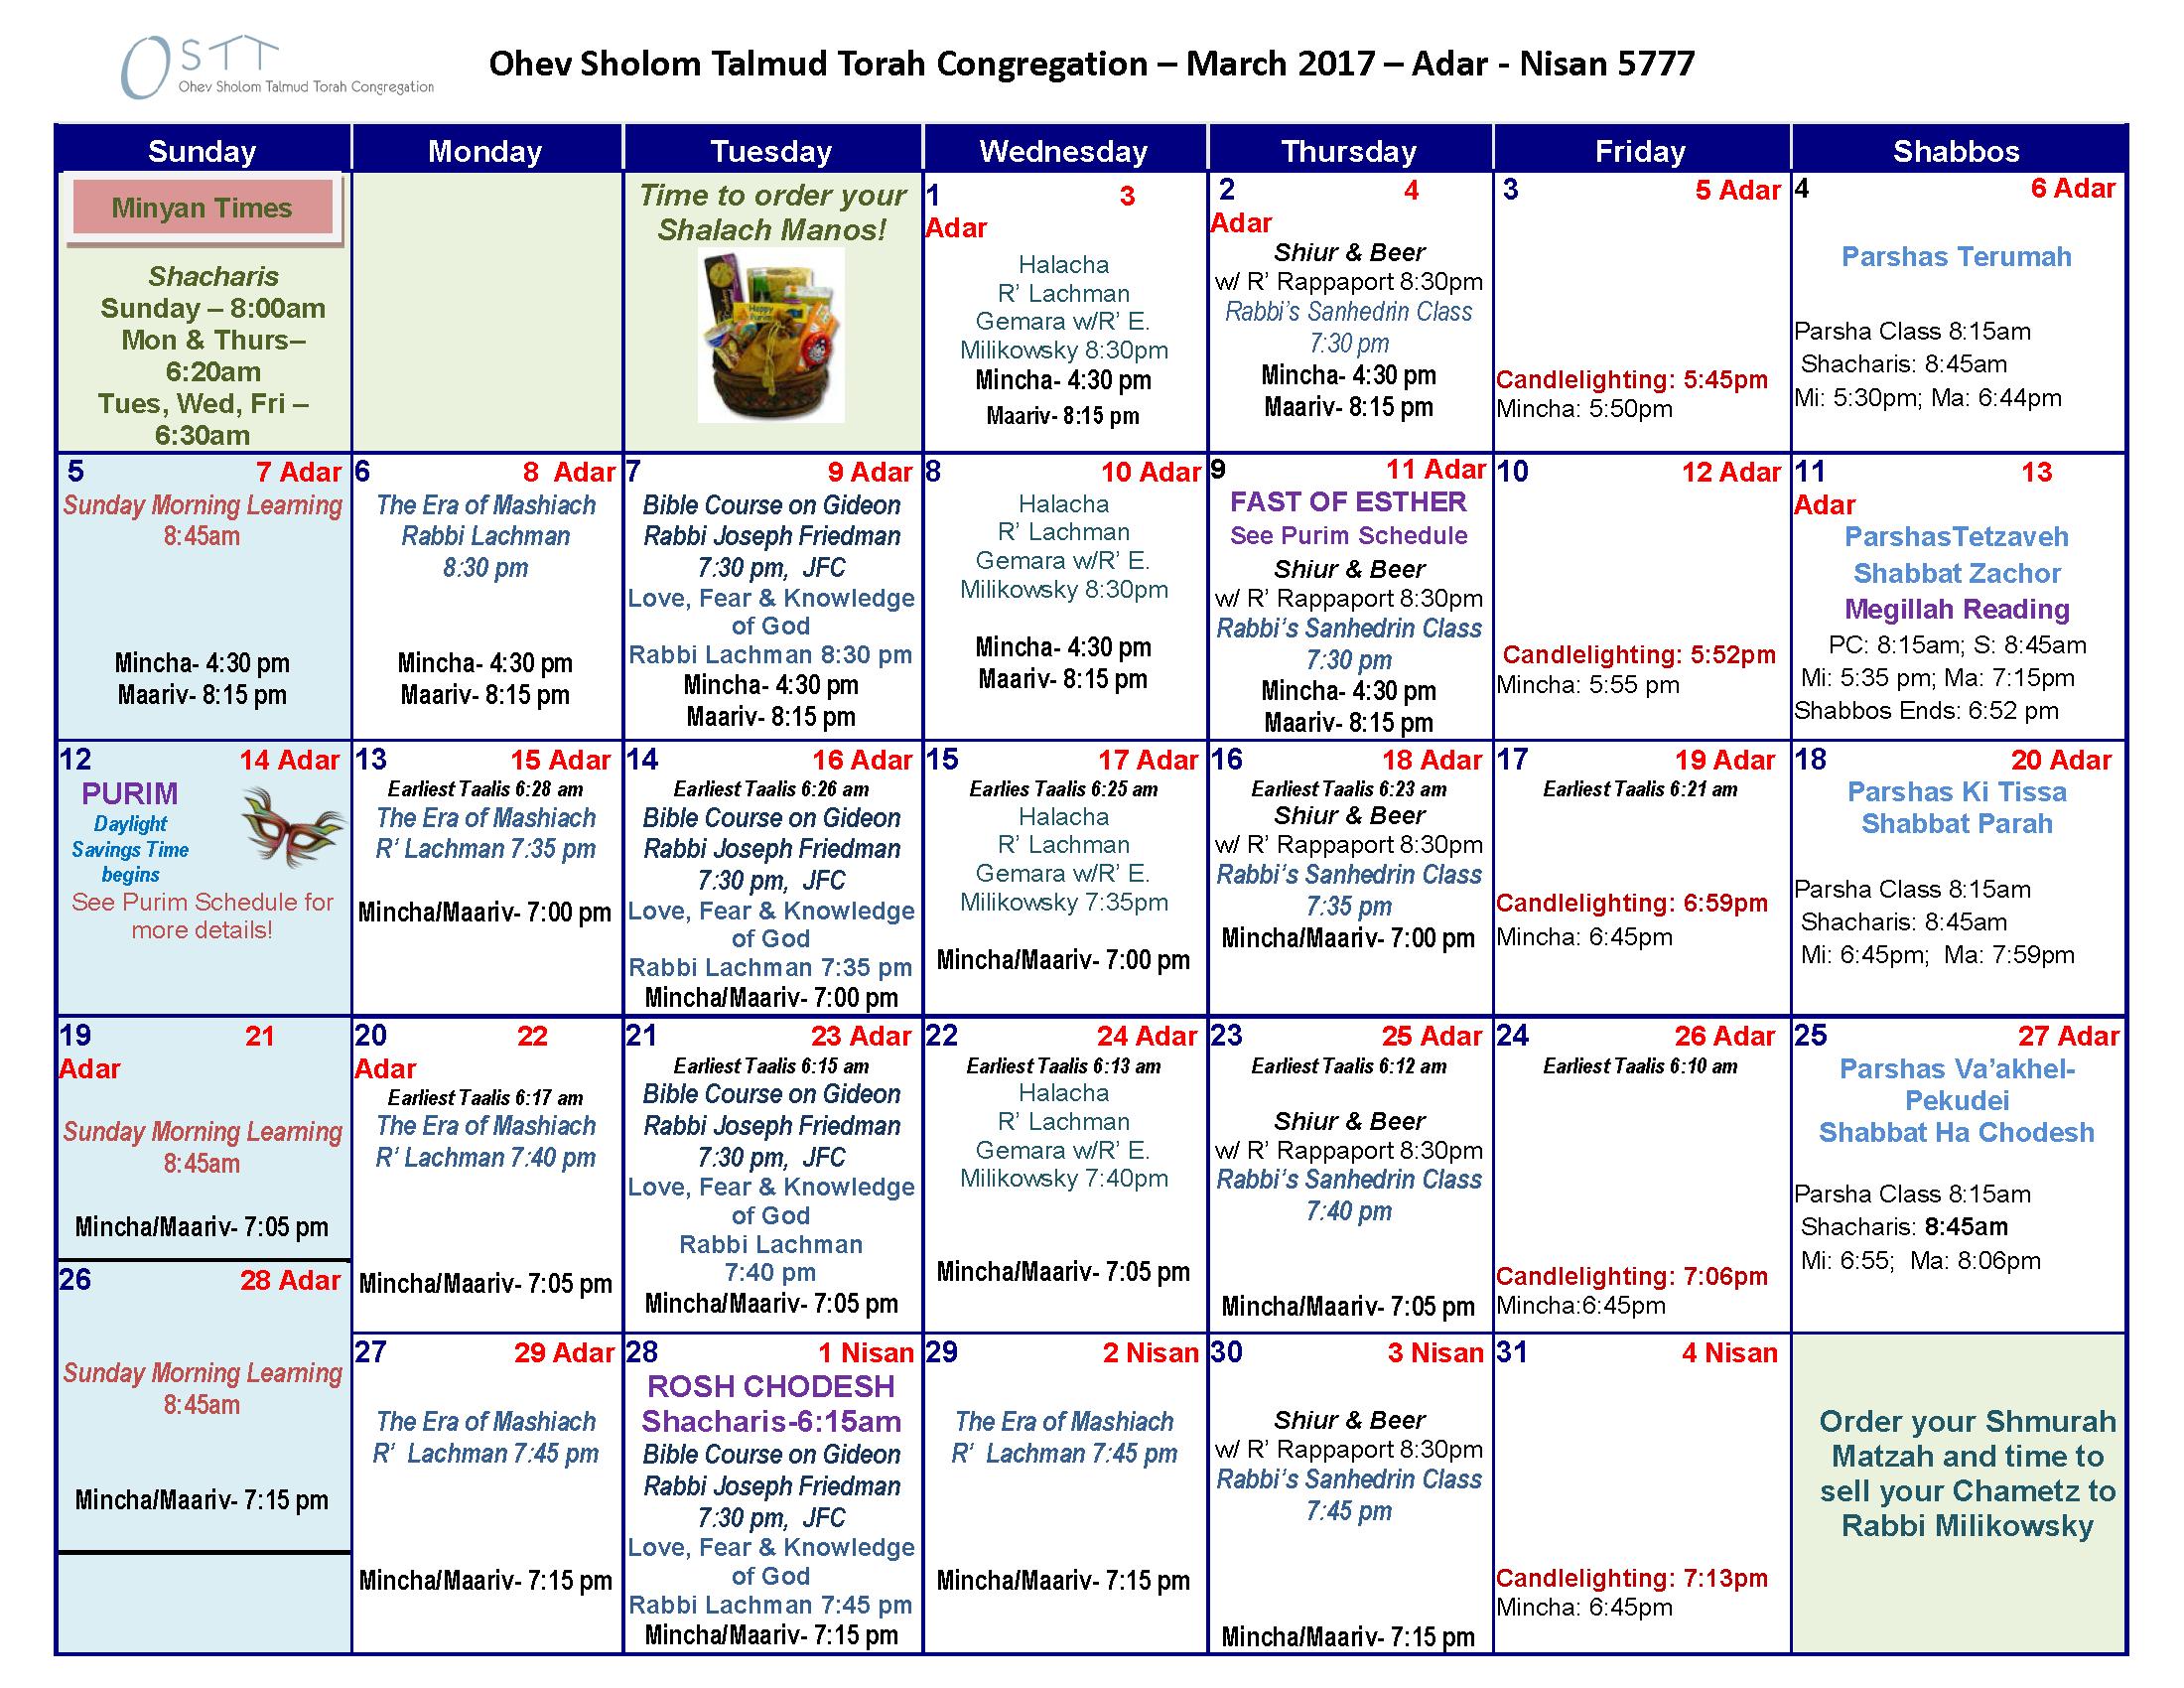 Torah Calendar.March 2017 Calendar Ostt Olney